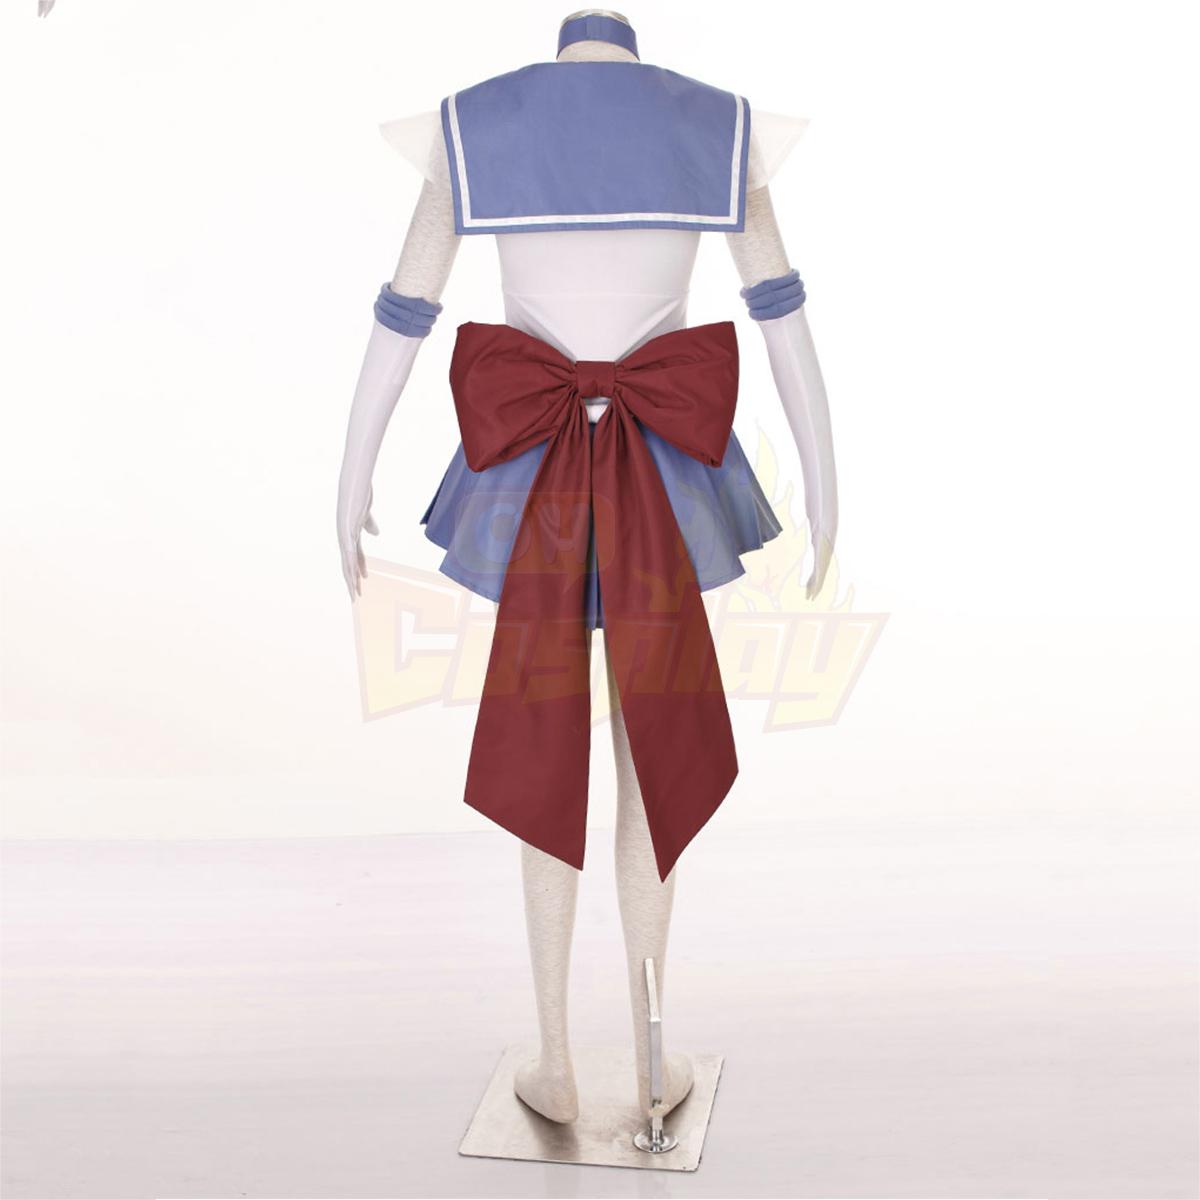 Sailor Moon Tomoe Hotaru 3RD Cosplay Costumes Deluxe Edition